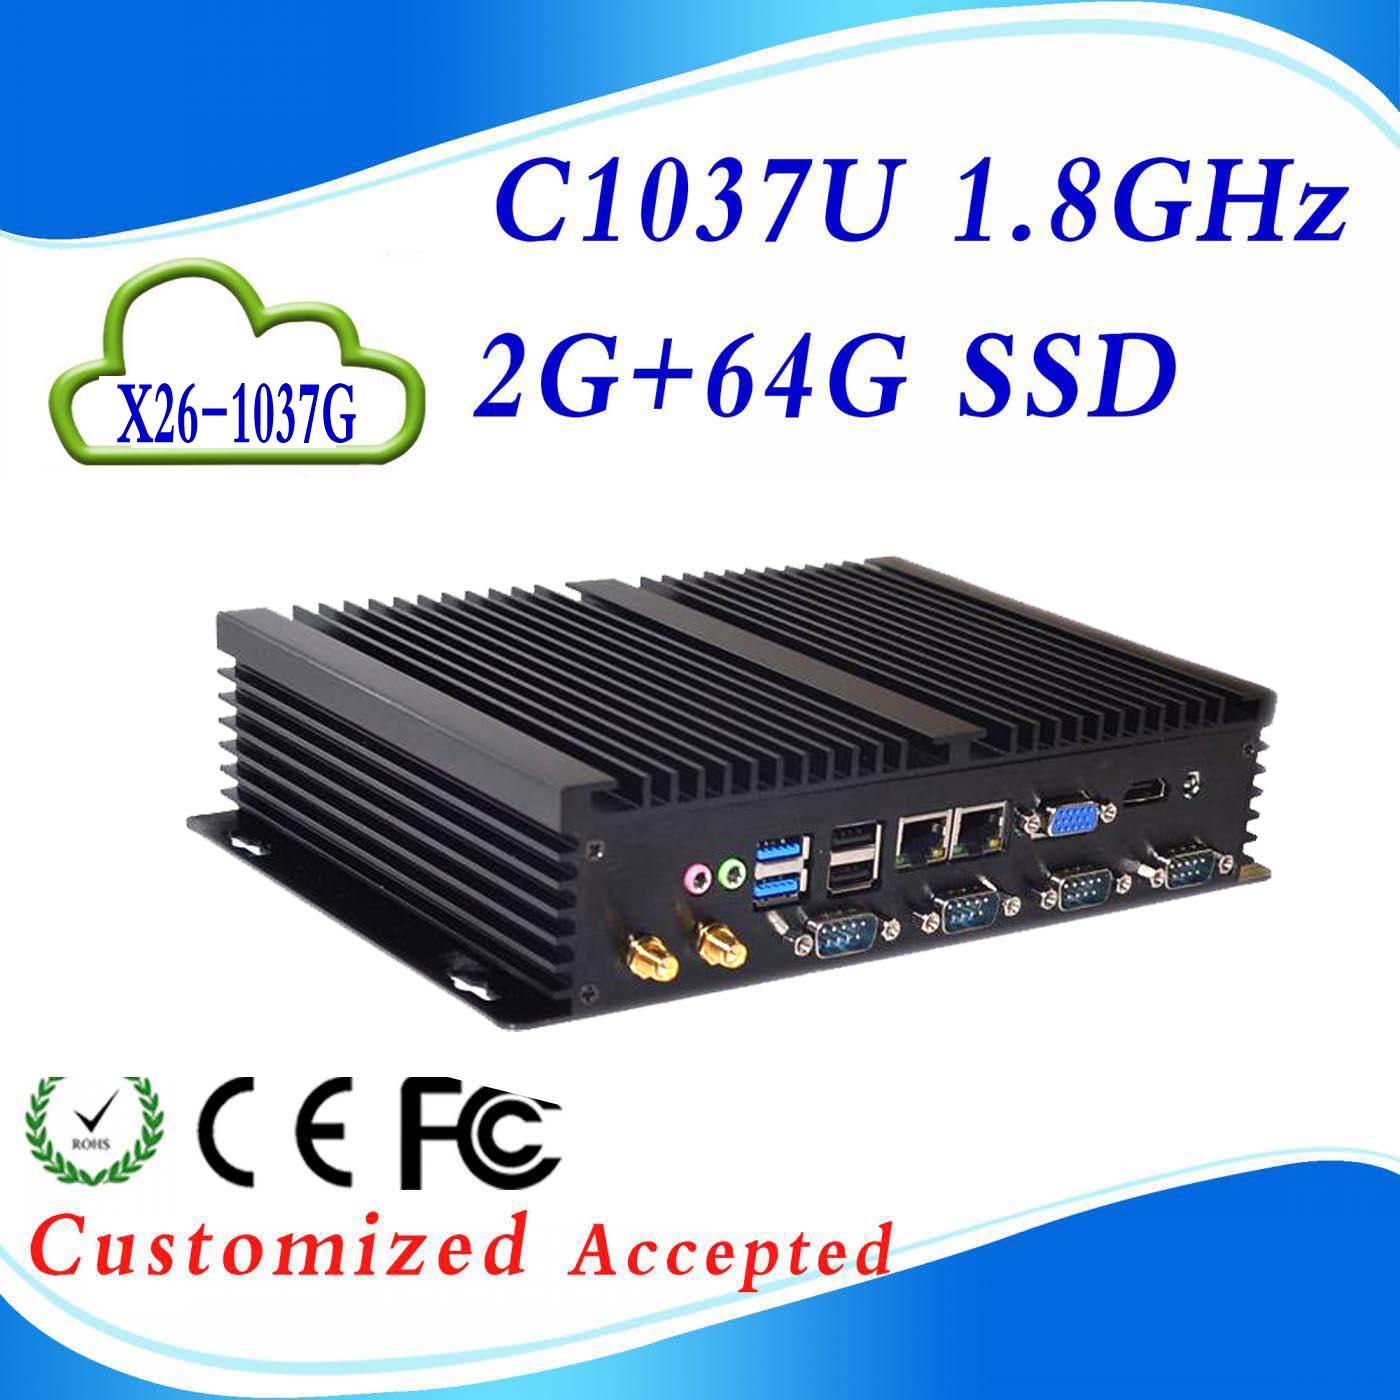 Support HDMI+VGA pc case fanless linux server mini computer X26-1037G C1037U 2G RAM 64G SSD High Performance(China (Mainland))